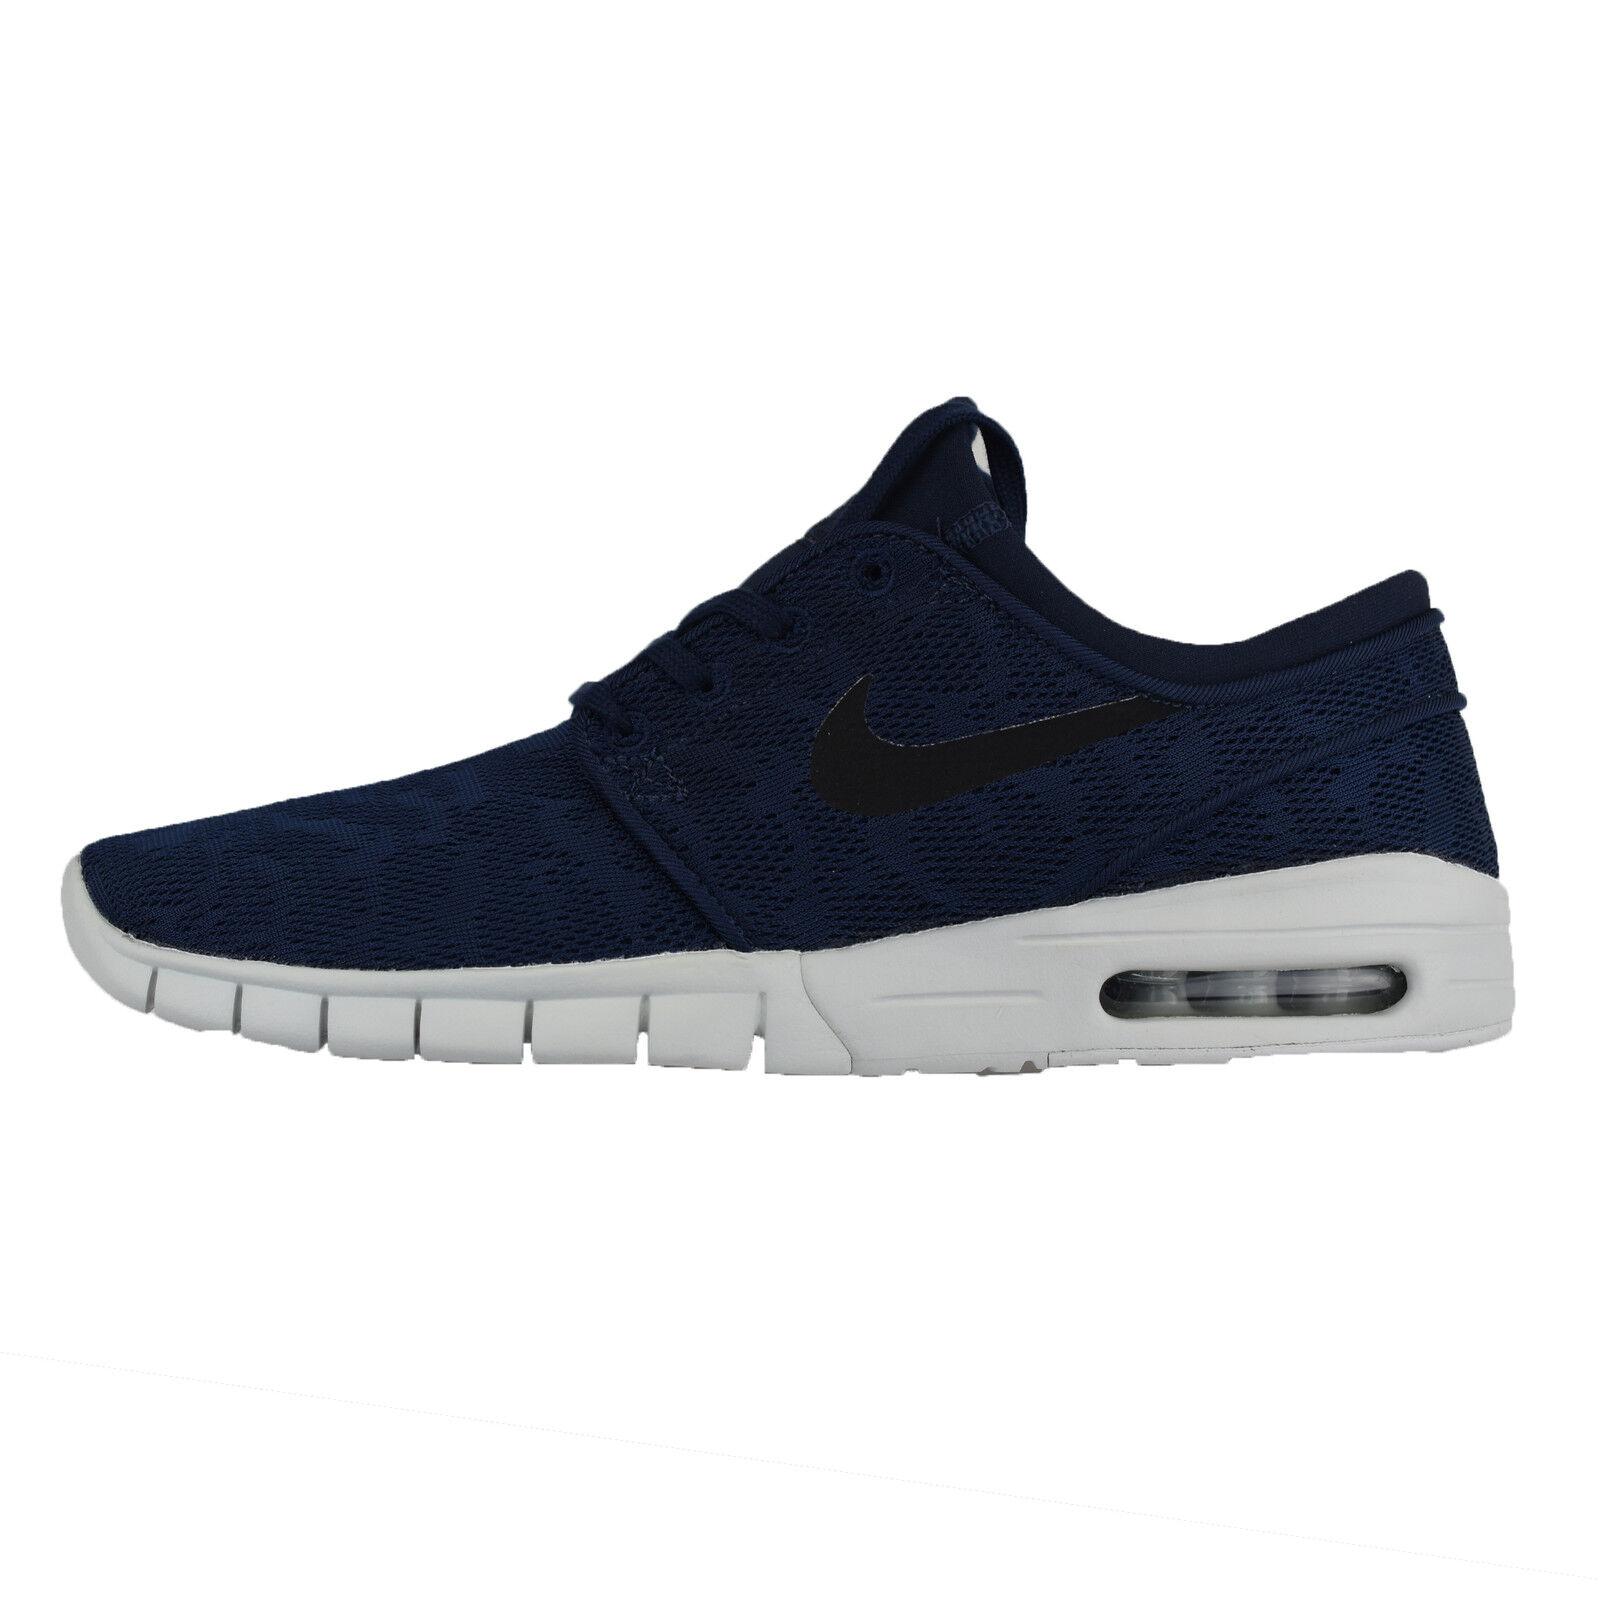 Nike Zoom Stefan Janoski MAX 631303-404 Skateboard Lifestyle Schuh Sneaker